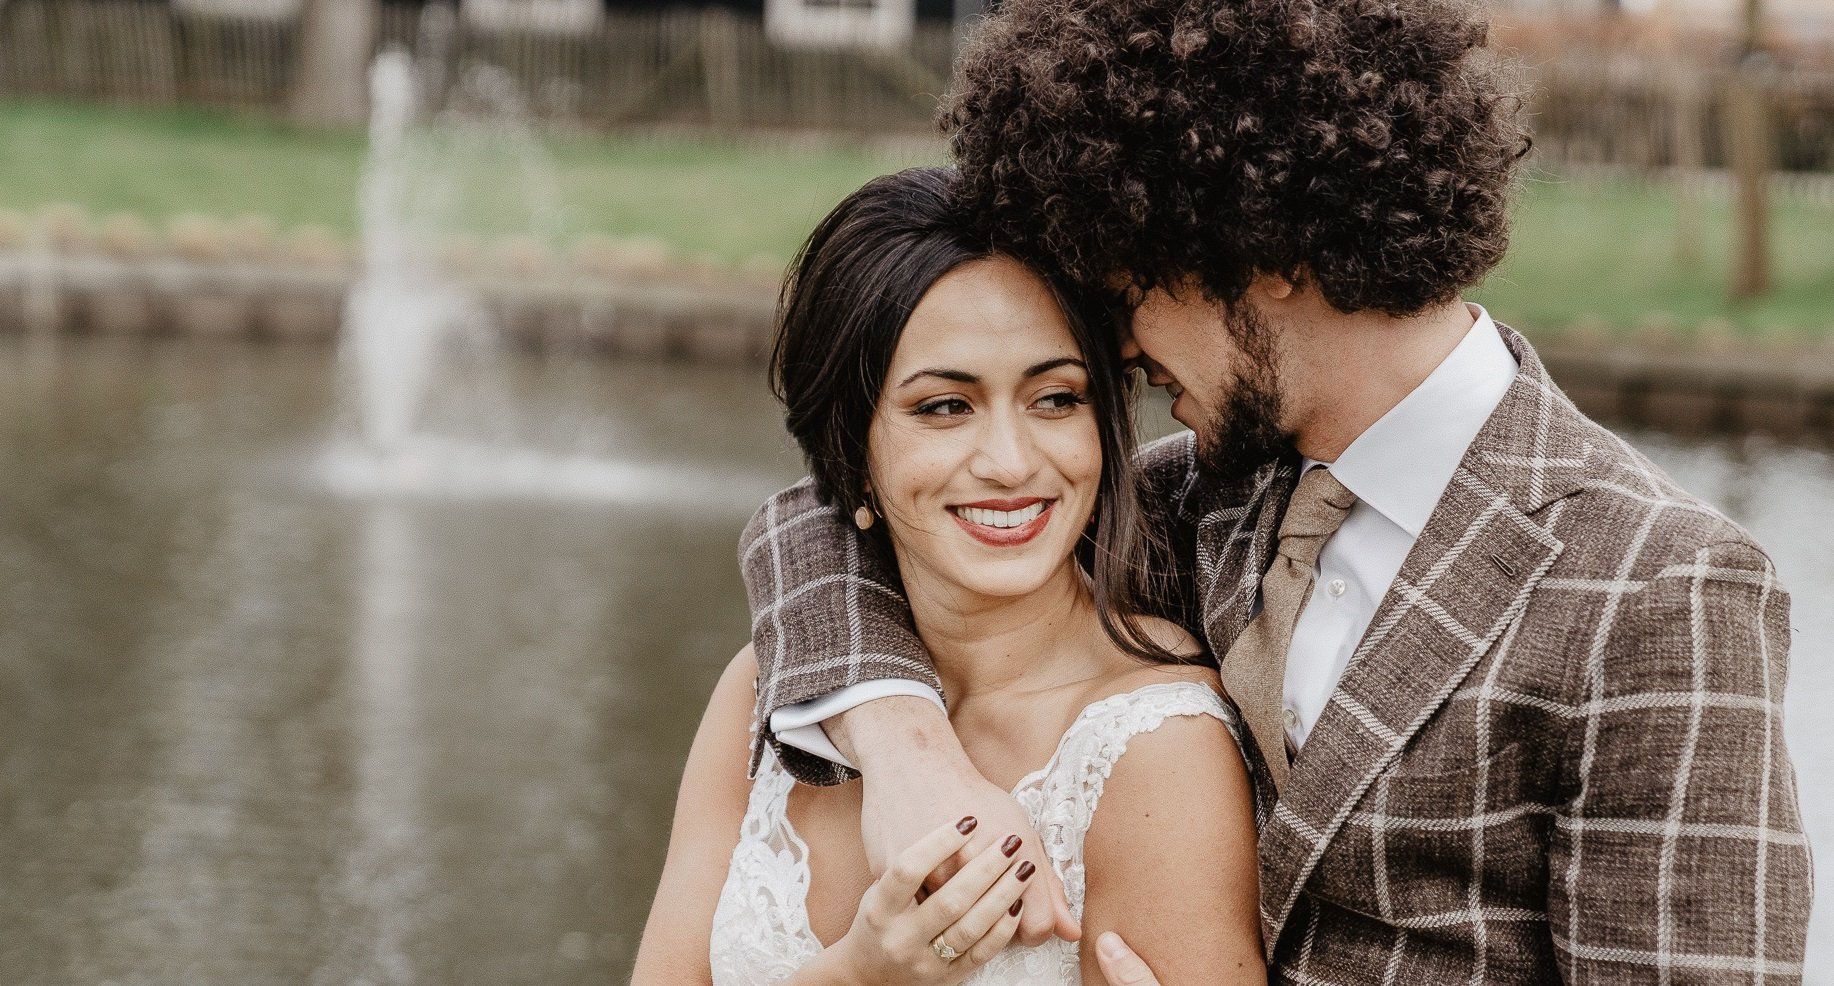 Bruidspaar net getrouwd